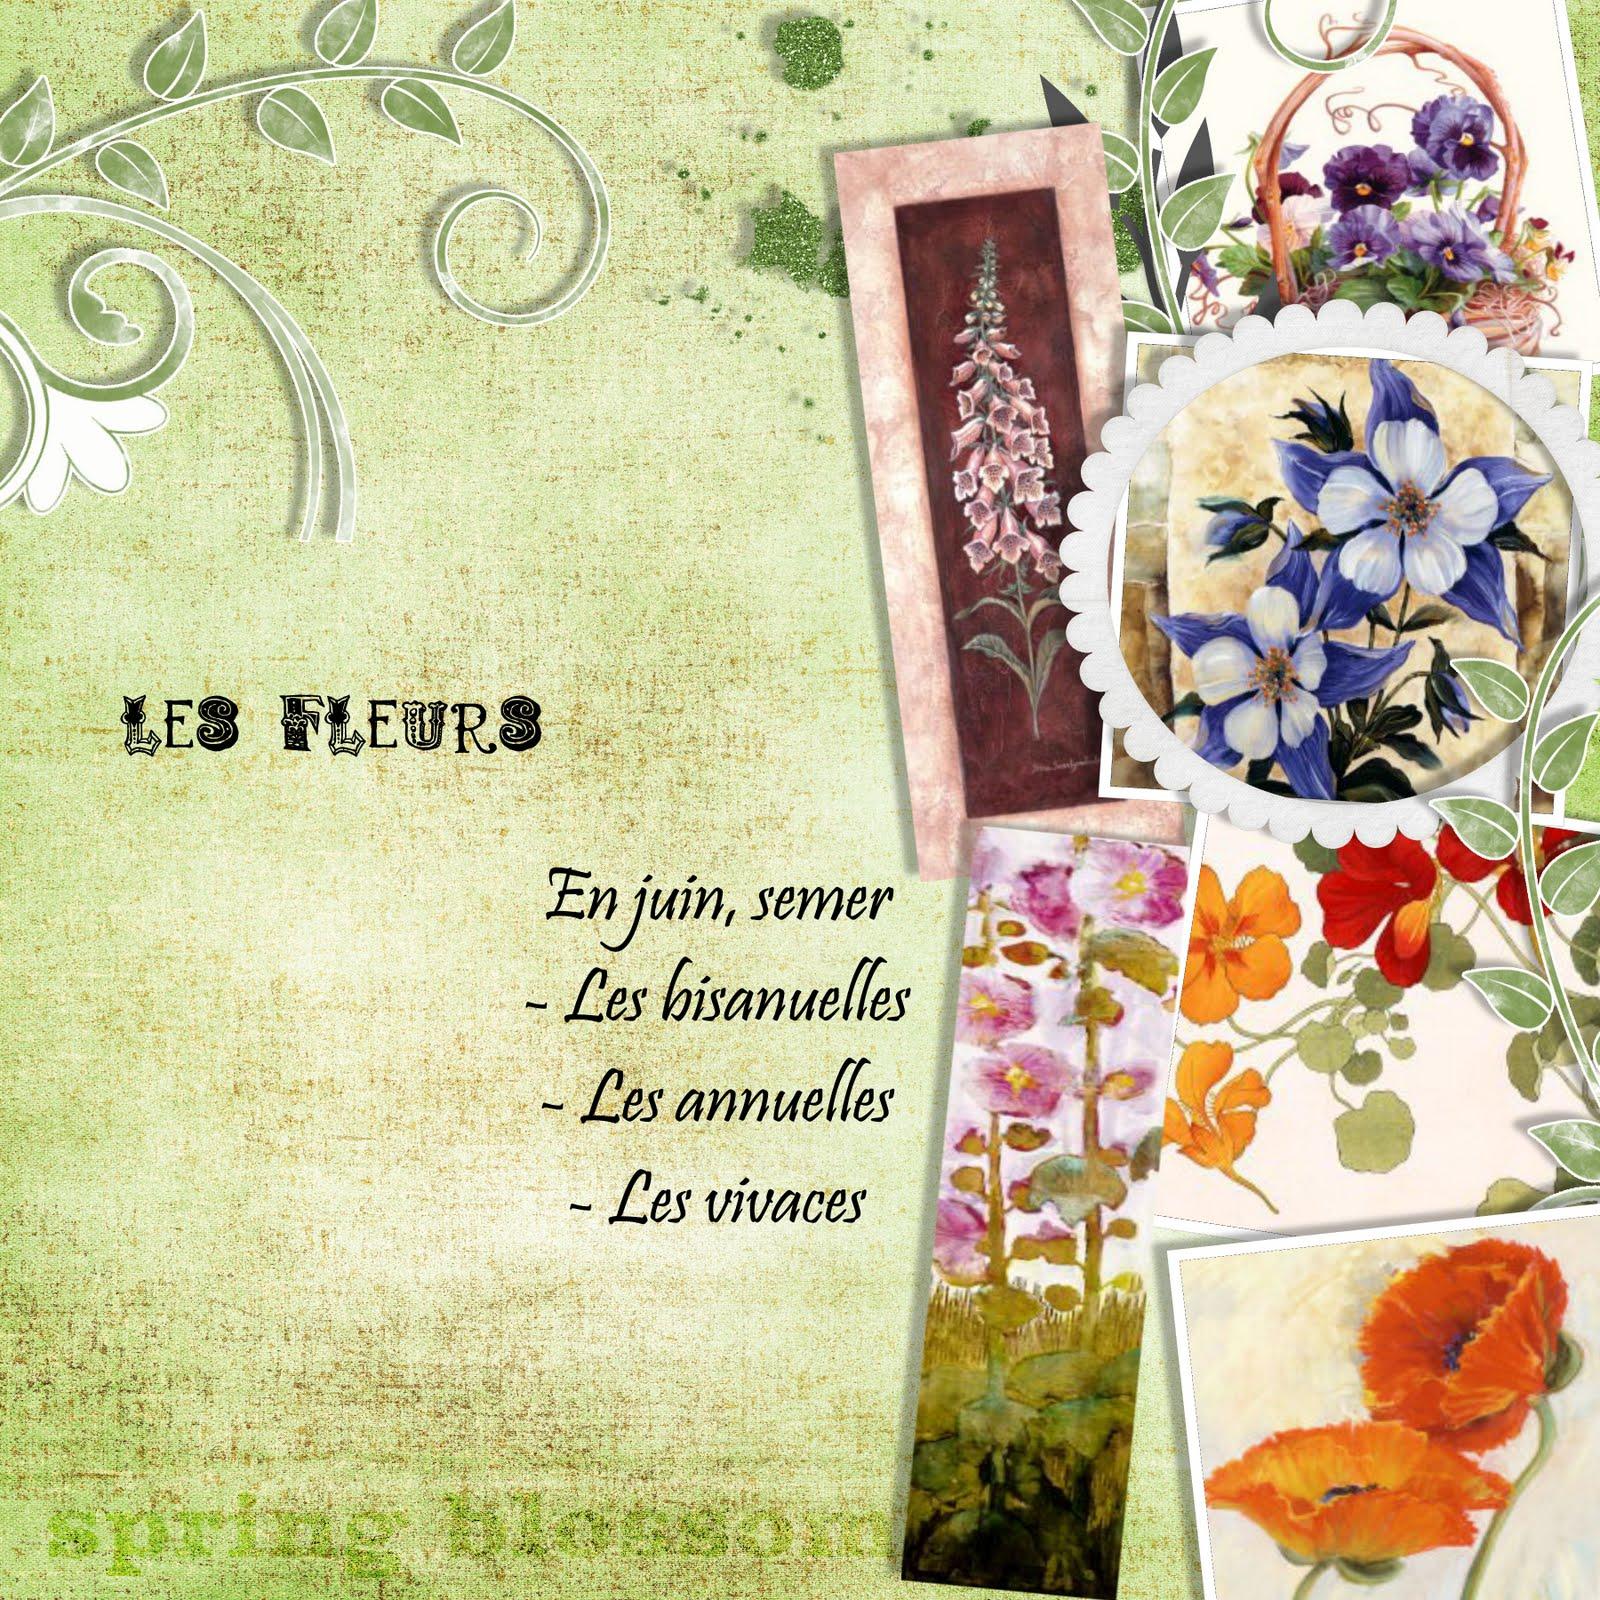 Jardin parfum juin 2010 - Semer roses tremieres septembre ...